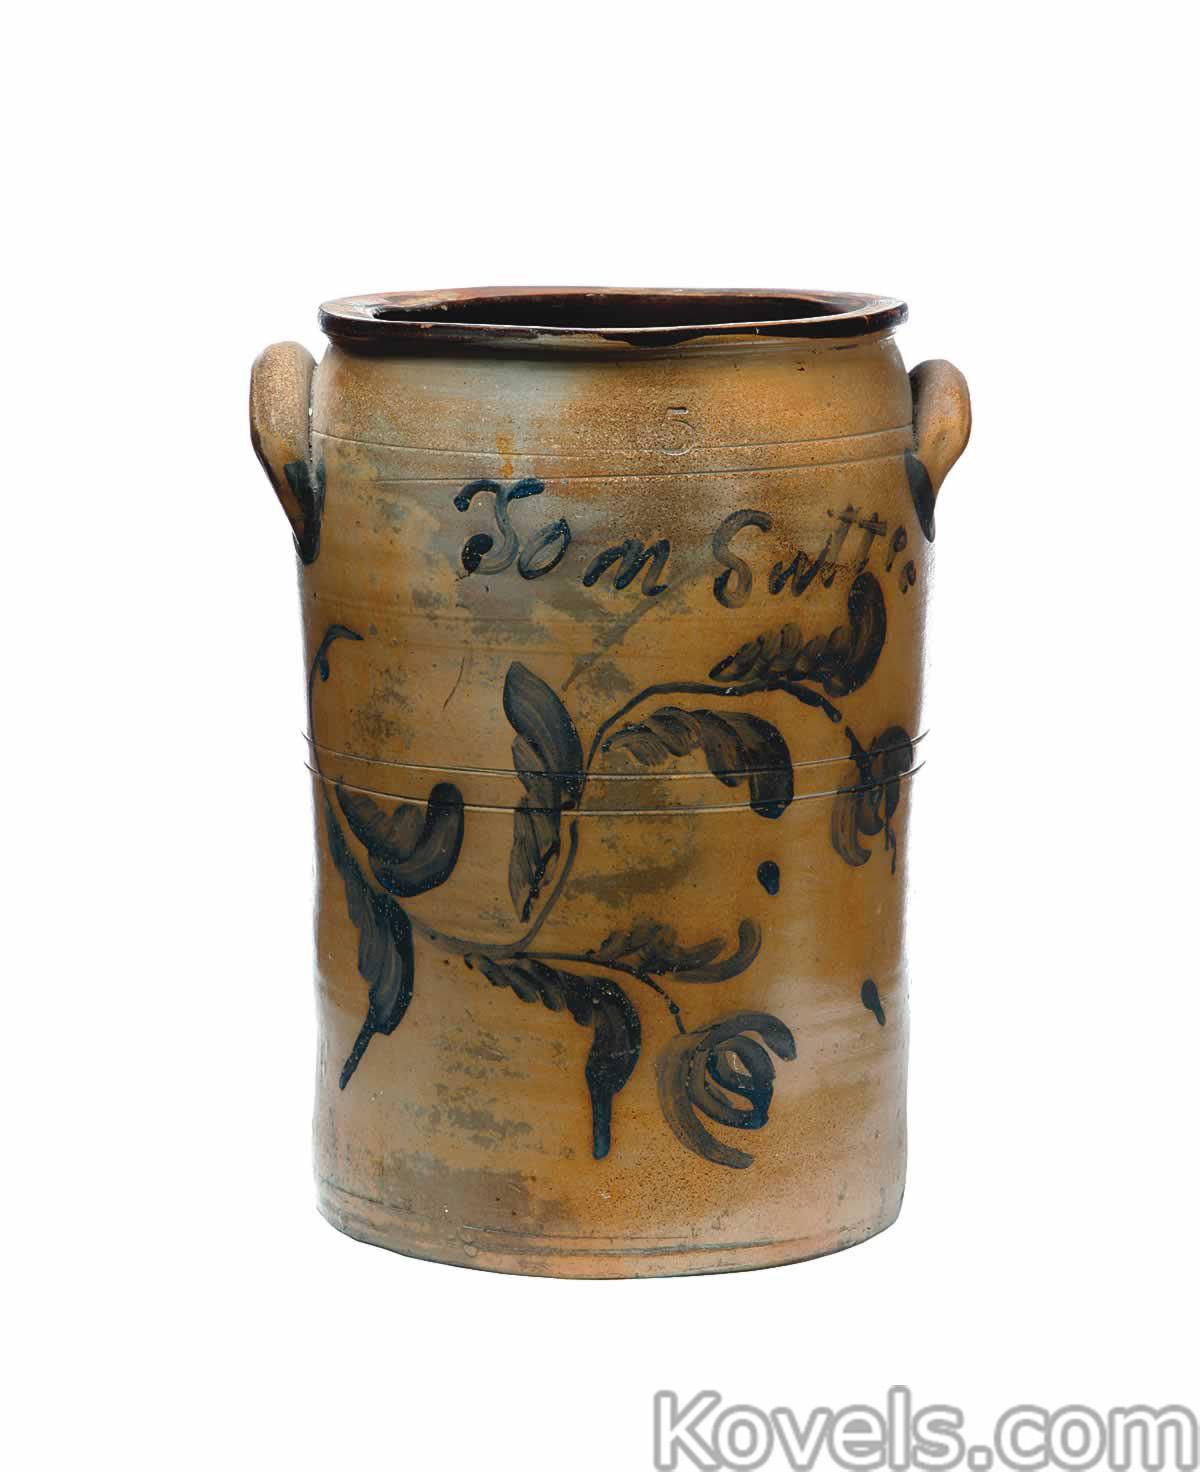 Antique stoneware pottery porcelain price guide antiques stoneware reviewsmspy